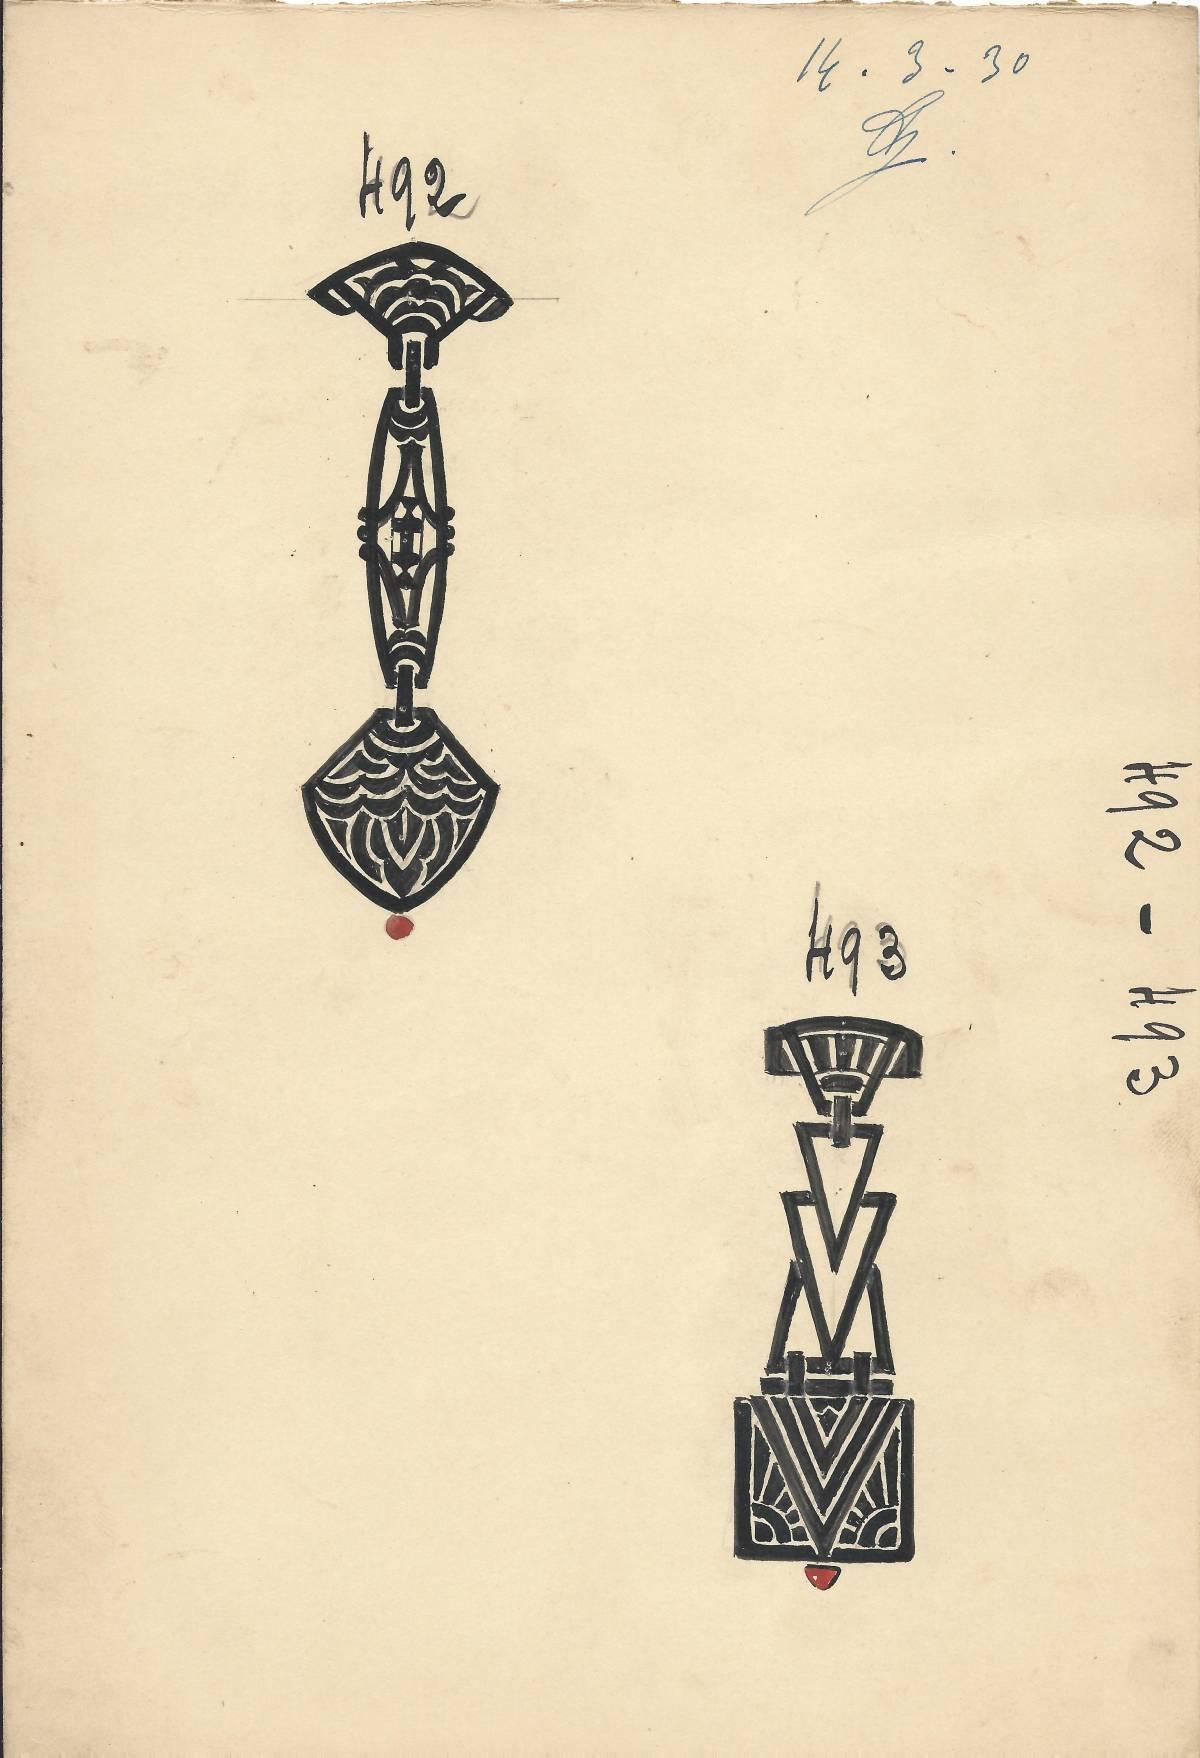 Raymond Pivert, tekening, 1930. Foto met dank aan Grafische Sammlung Stern©